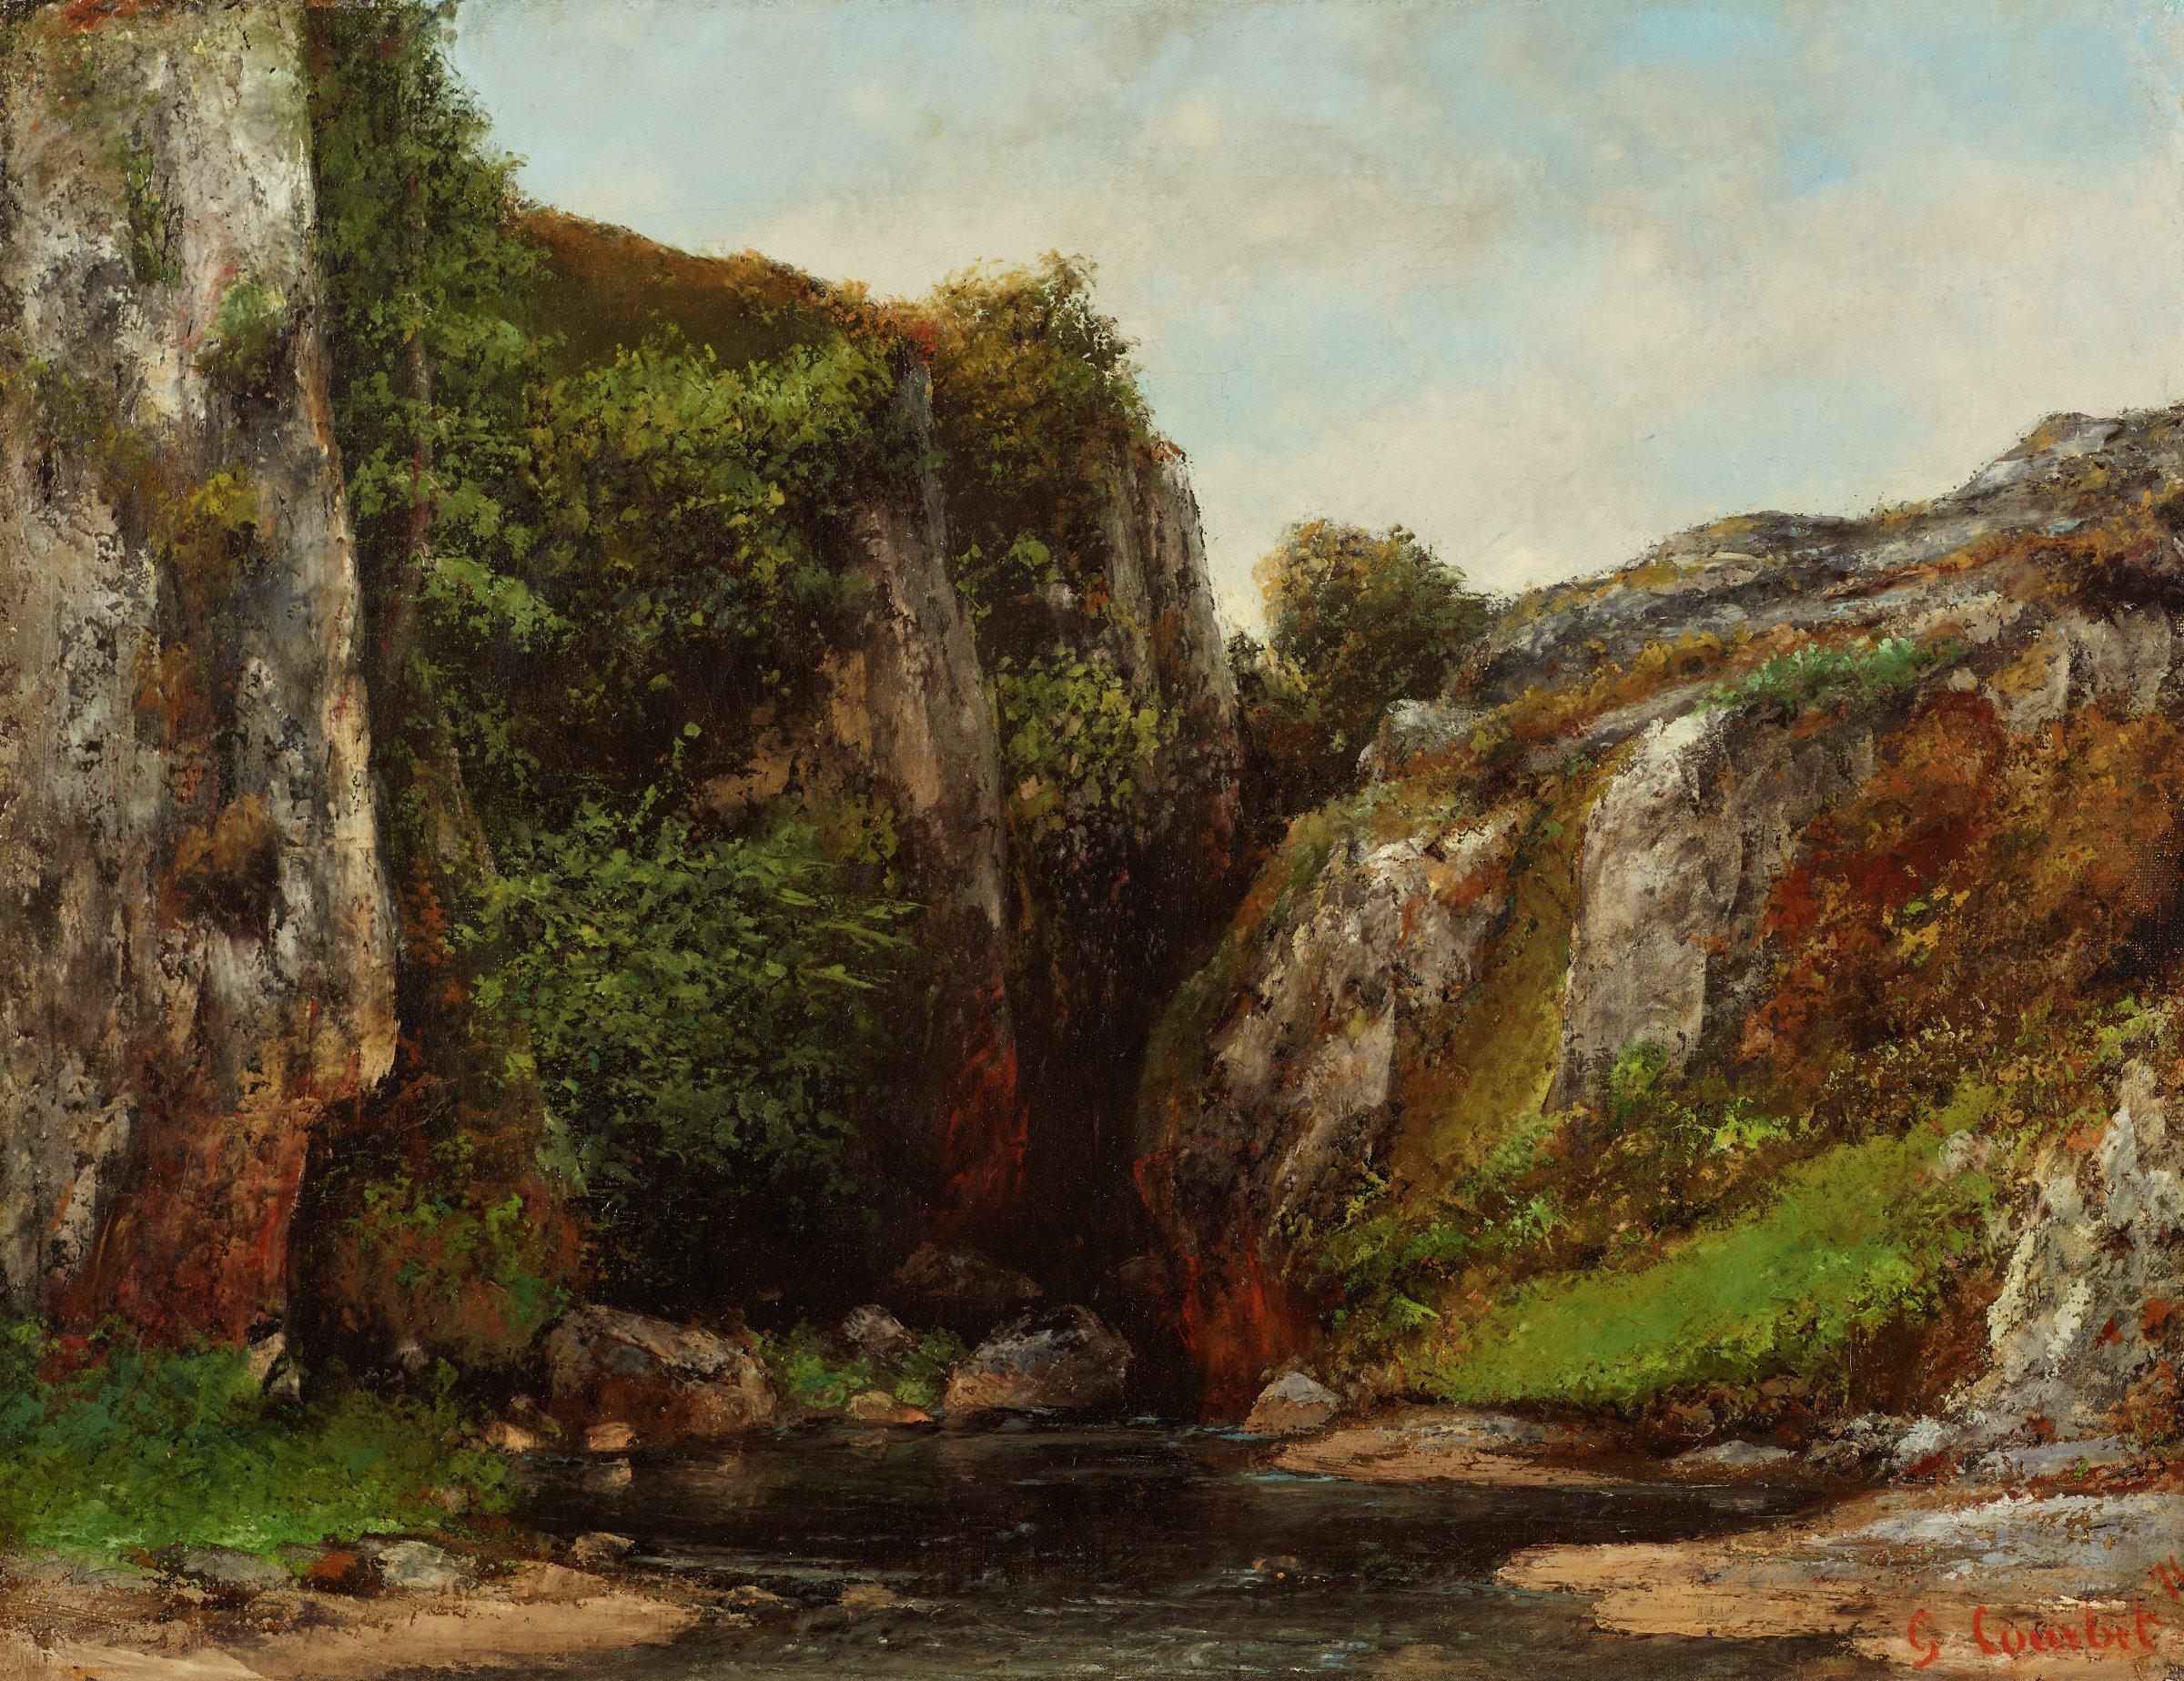 Entrée d'un gave (Source of a Mountain Stream), Gustave Courbet, oil on canvas